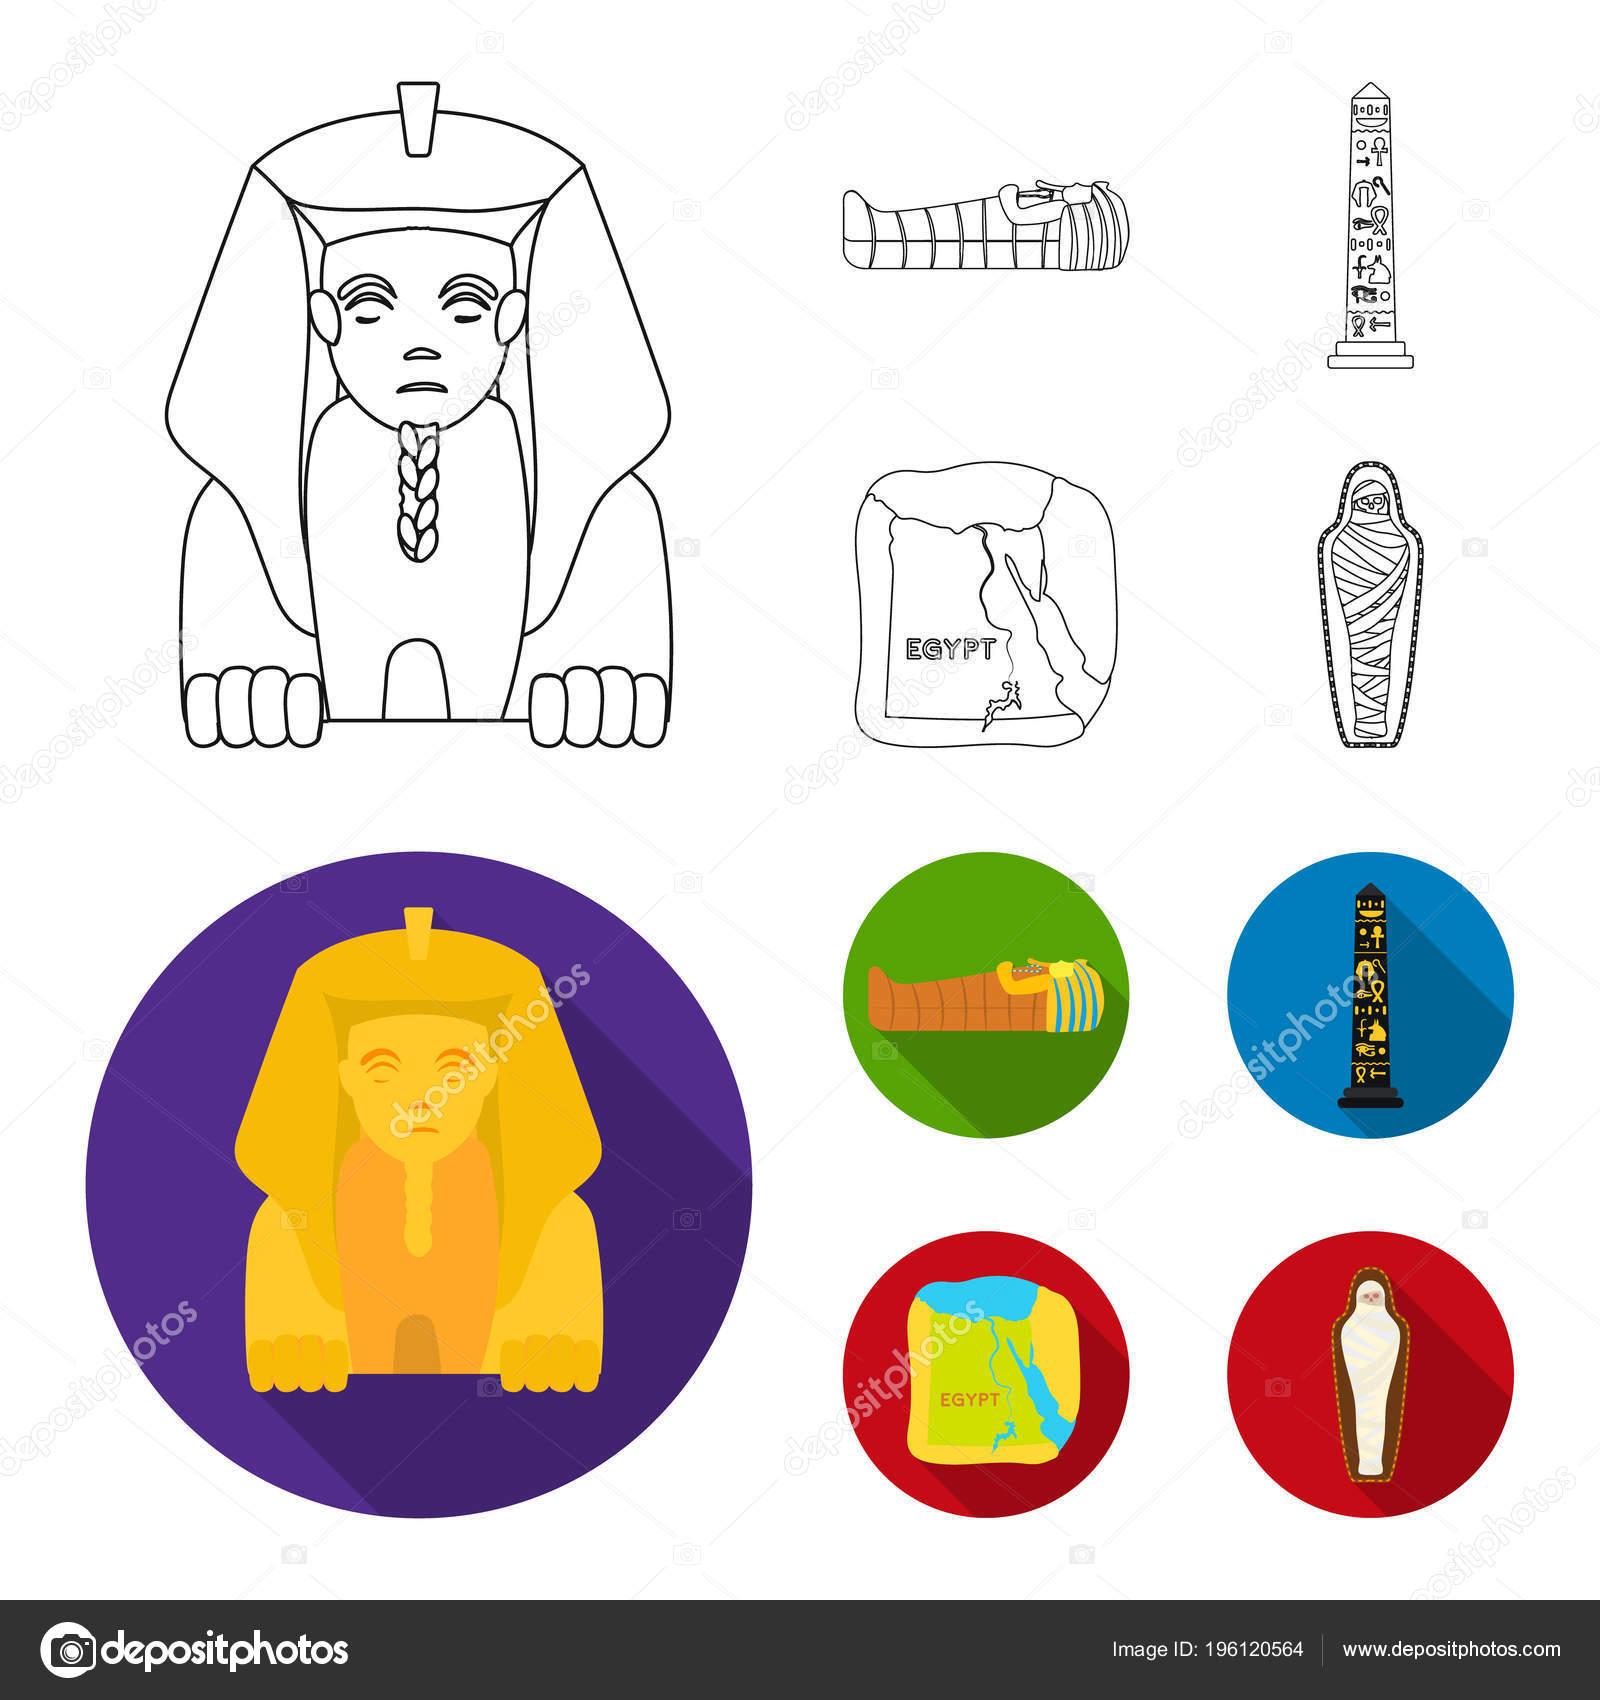 O Territorio Do Egito A Esfinge O Sarcofago Do Farao O Pilar